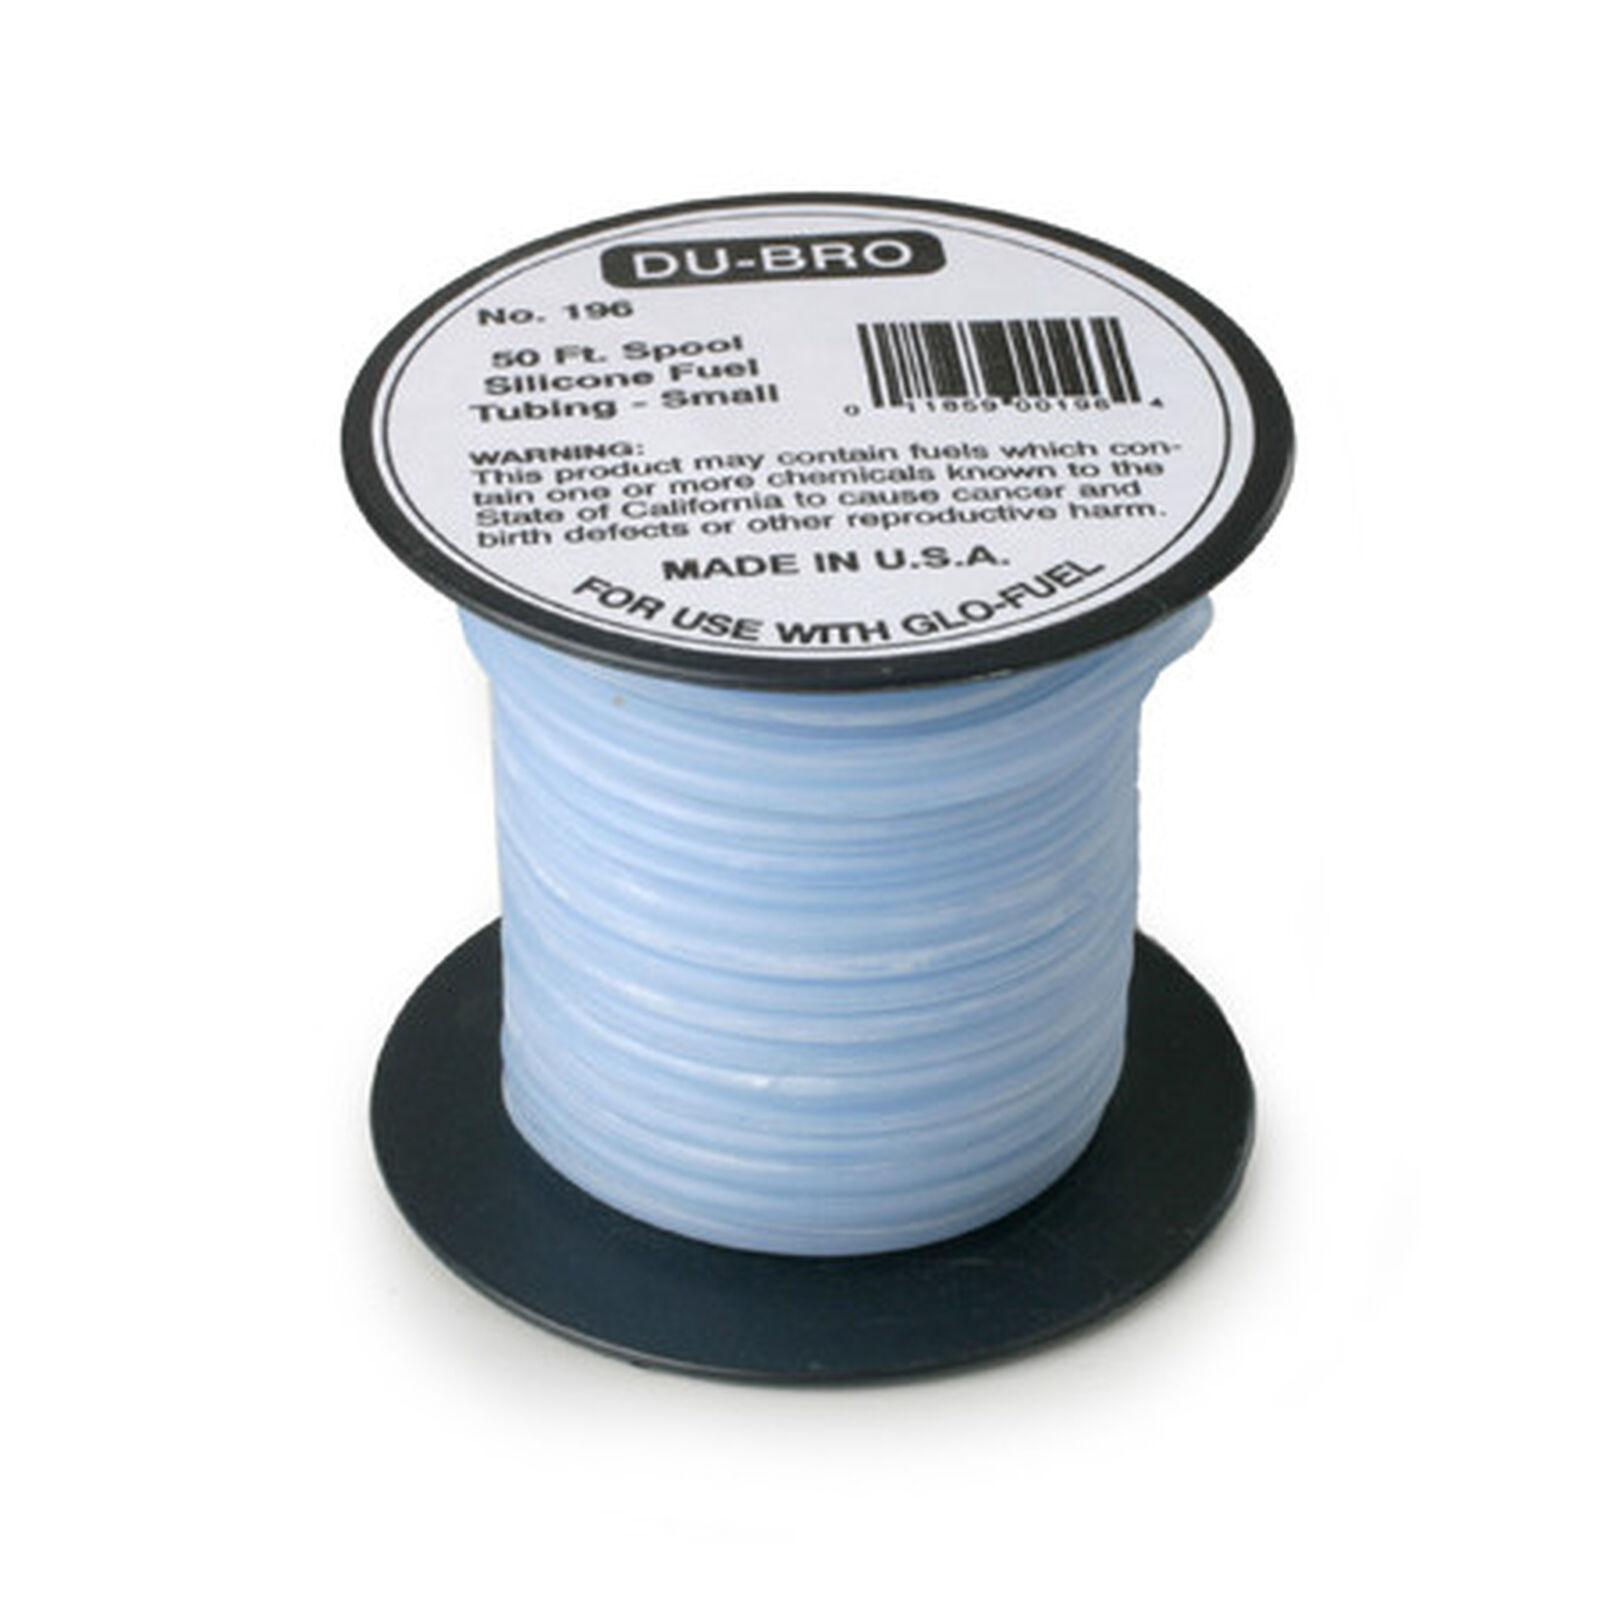 Silicone Fuel Blue Tubing, Small, 50'